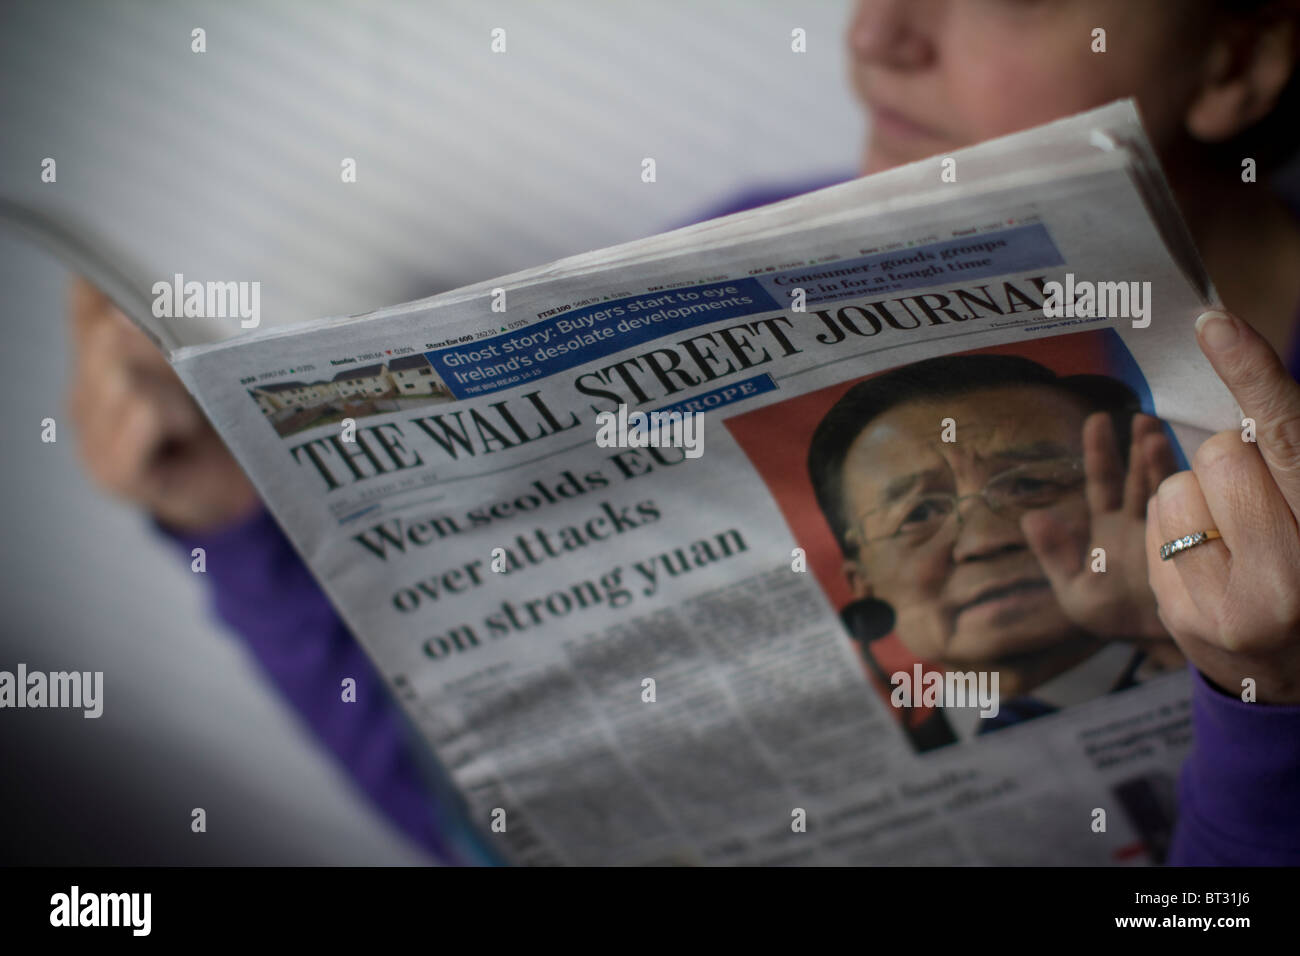 Wall Street journal reader - Stock Image